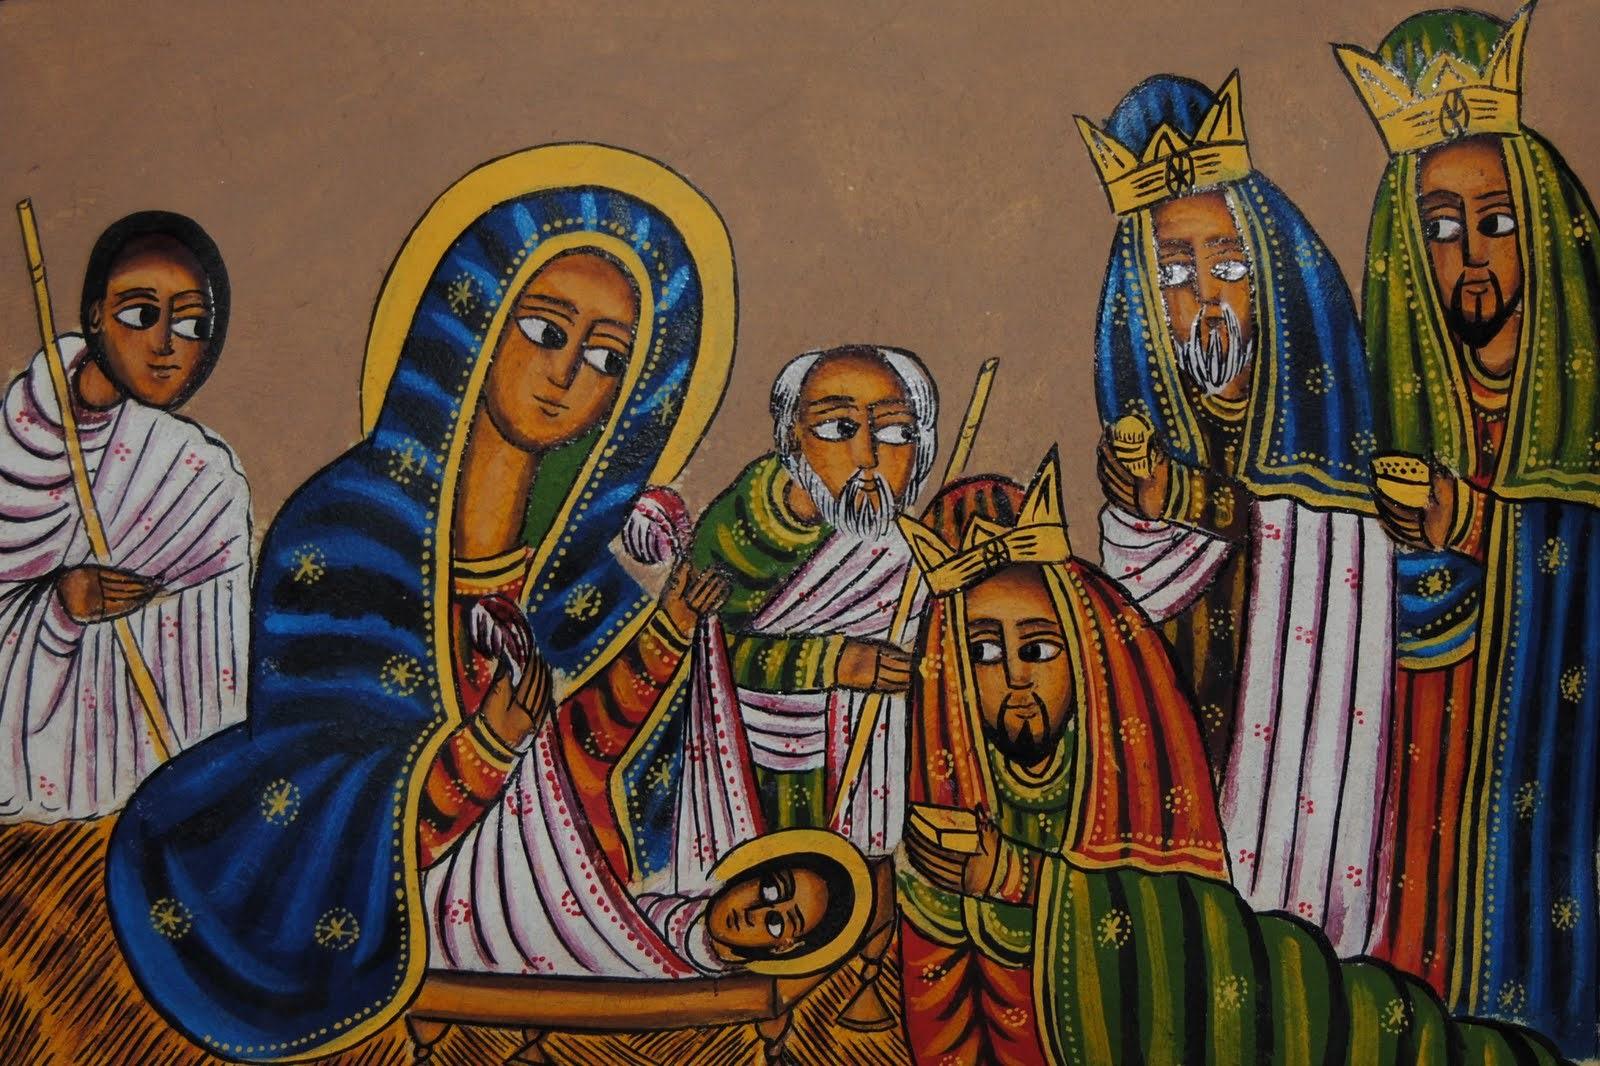 Traditional Ethiopian Orthodox art depicting the Nativity.